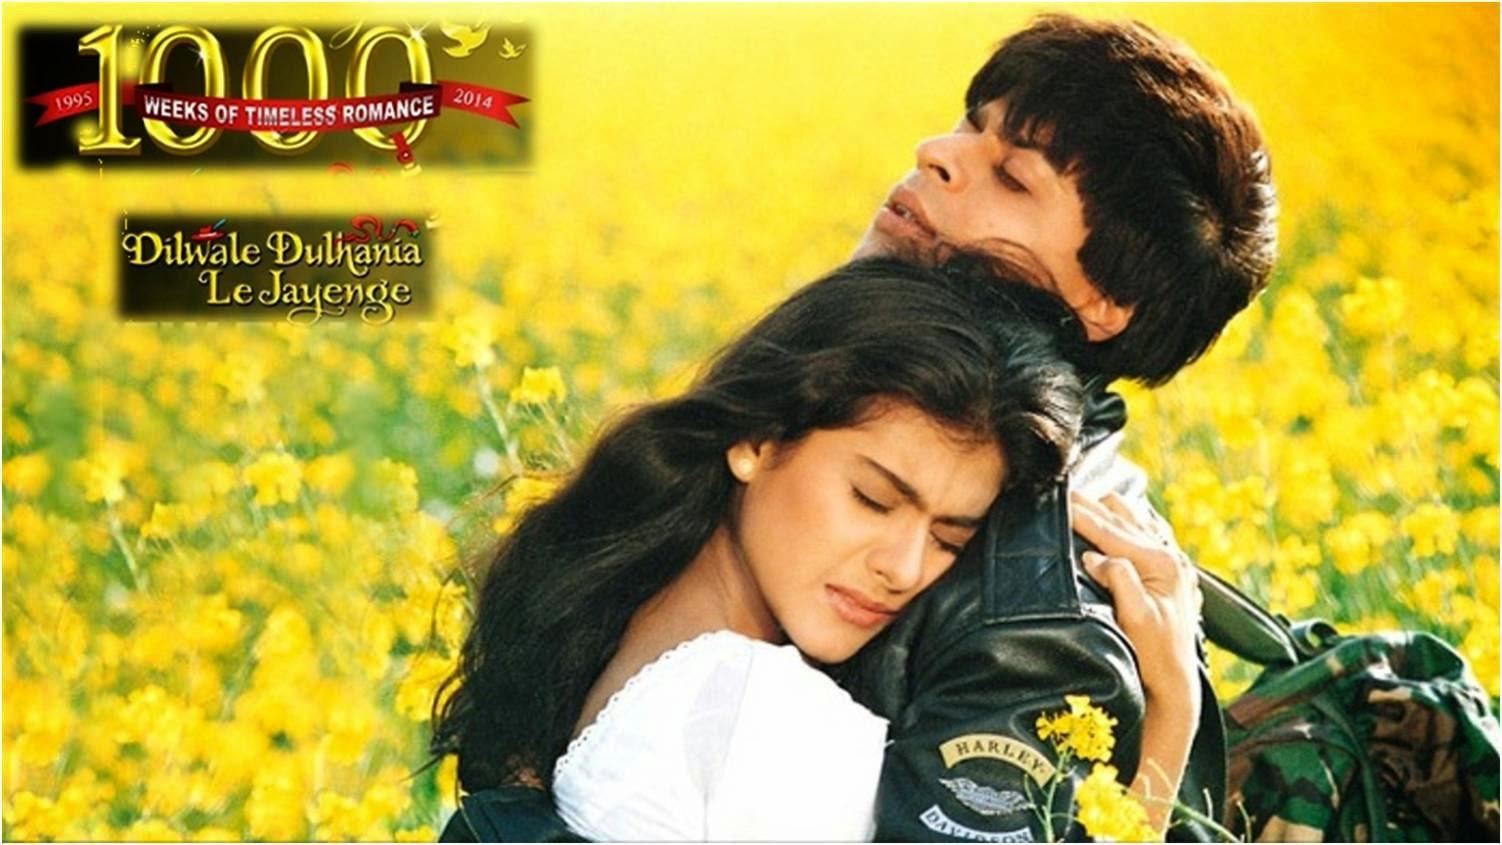 DDLJ: Romantic love story of Shahrukh Khan and Kajol in Dilwale Dulhaniya Le Jayenge